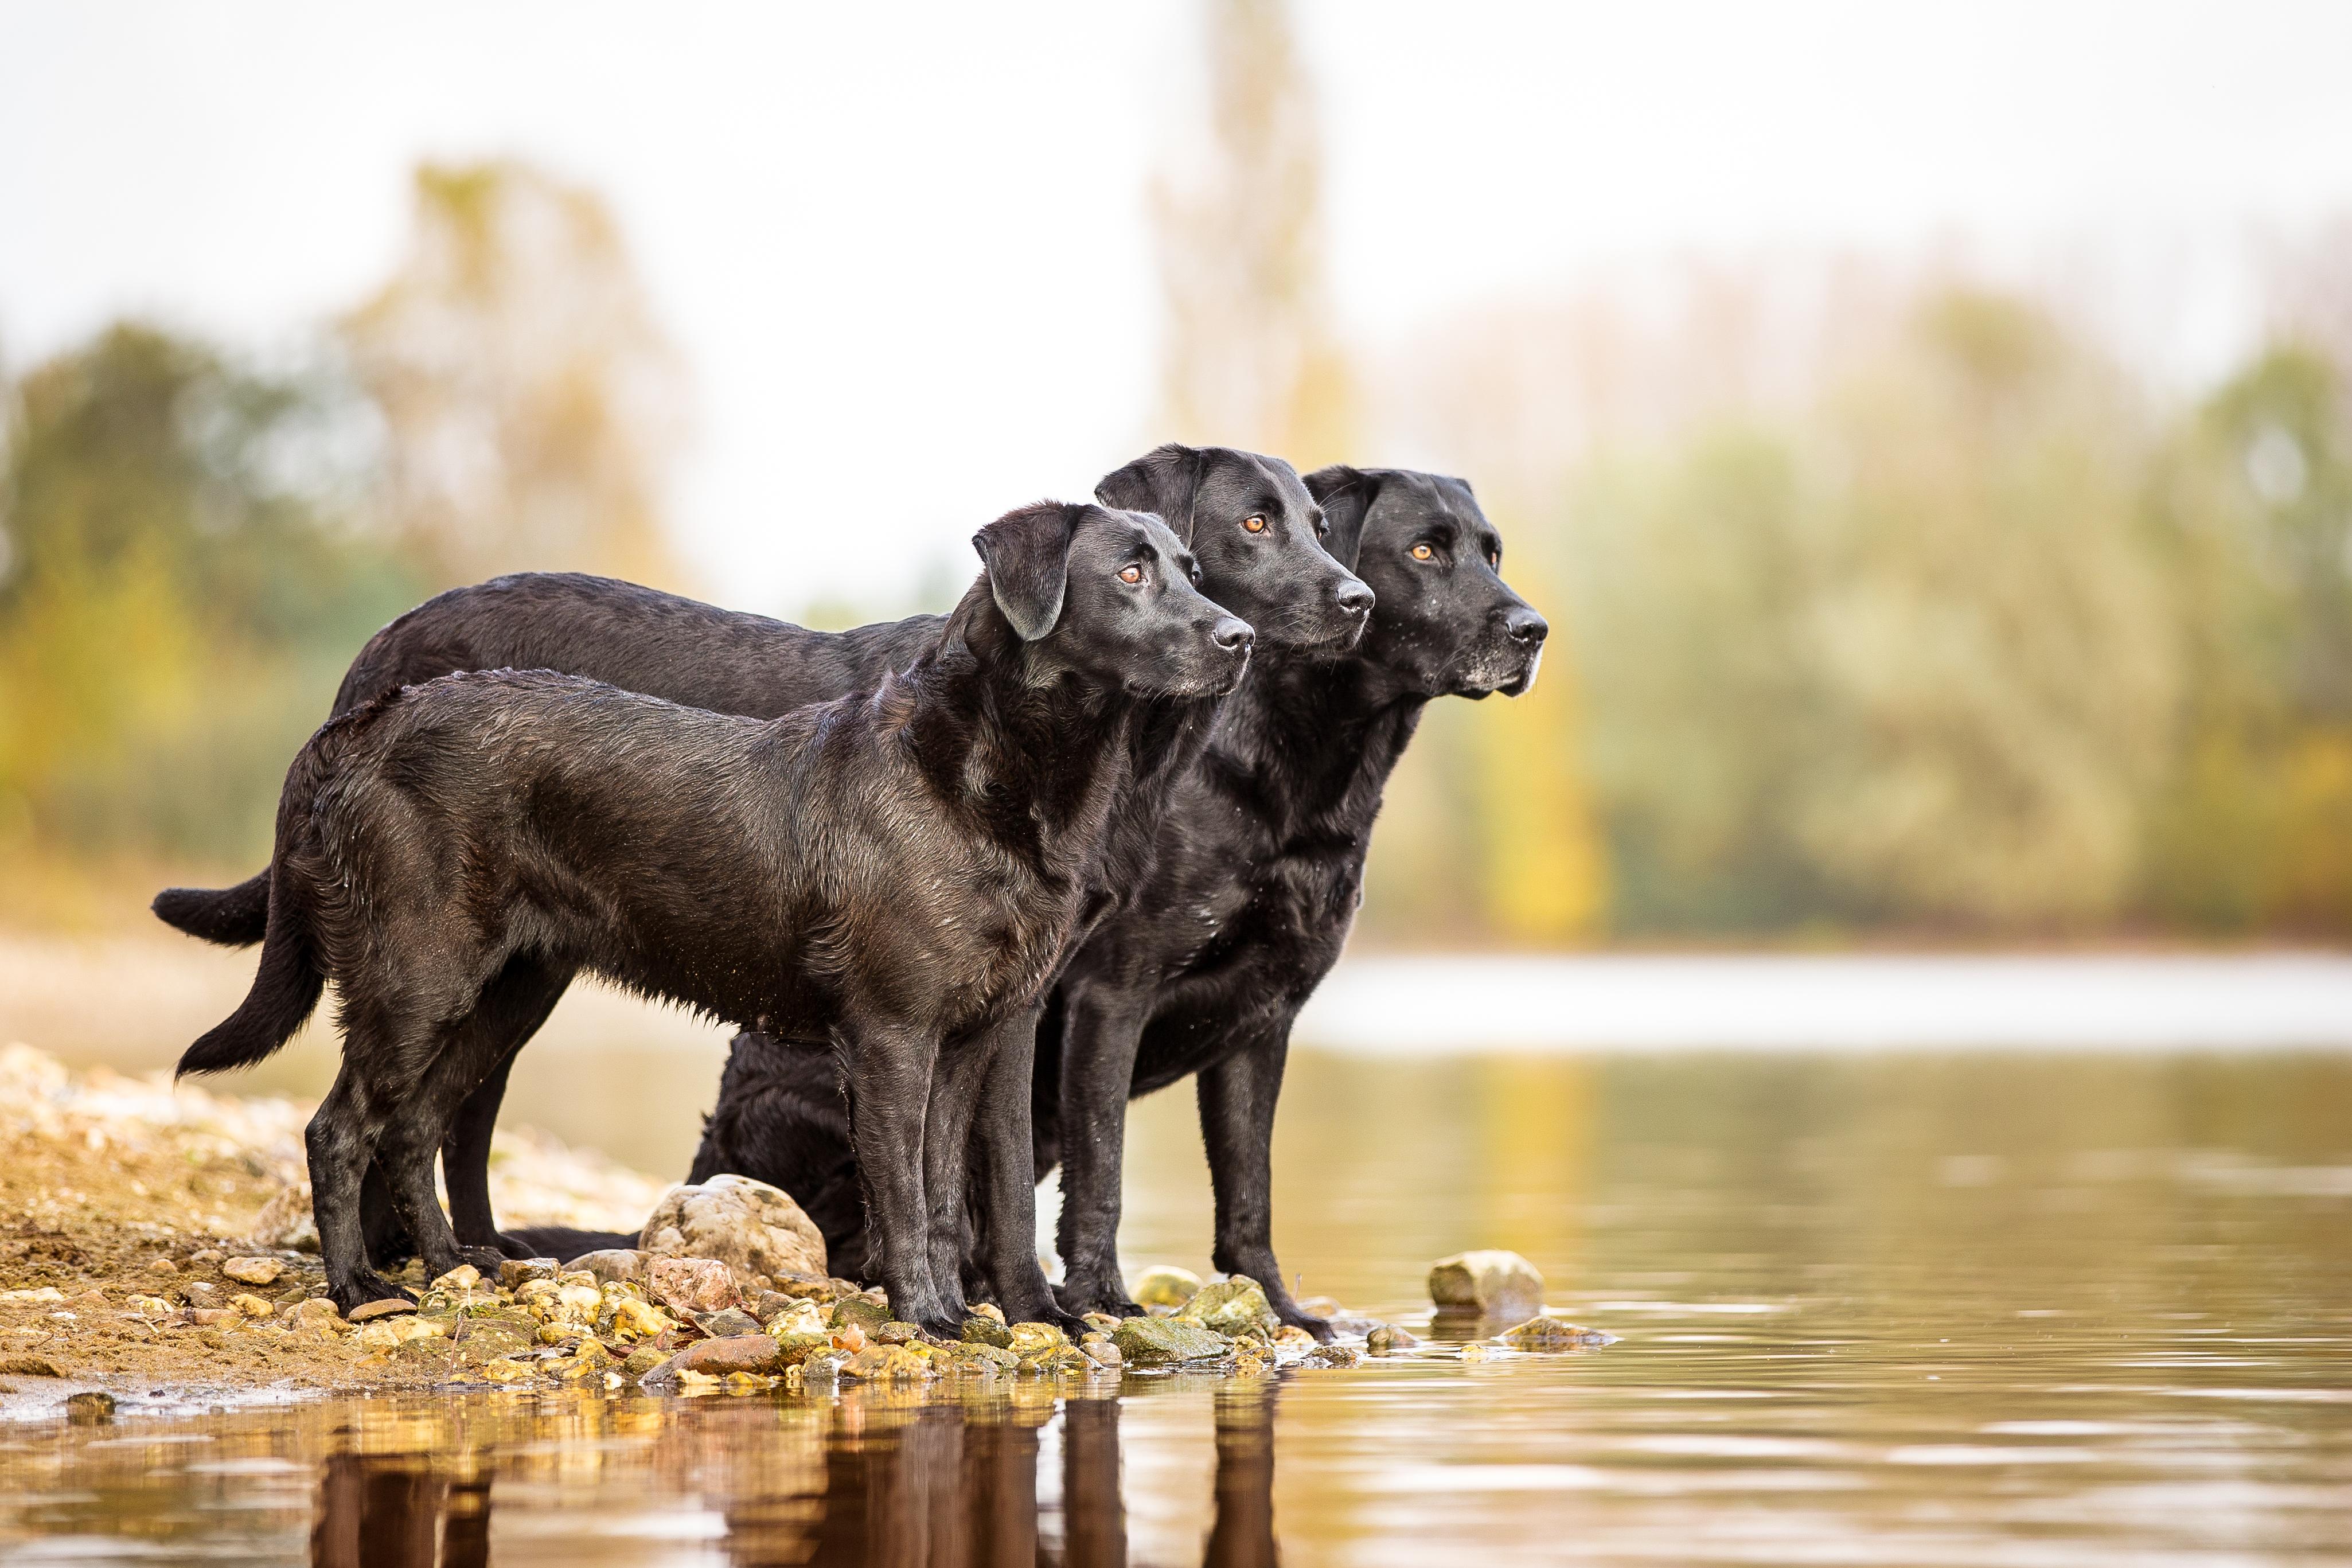 Wir Zuchten Field Trial Golden Und Labrador Retriever Im Deutschen Retriever Club E V Drc Unter Dem International Geschutztem Zwingernamen Gundog S Choice Gundog Jagd Hund Ltd